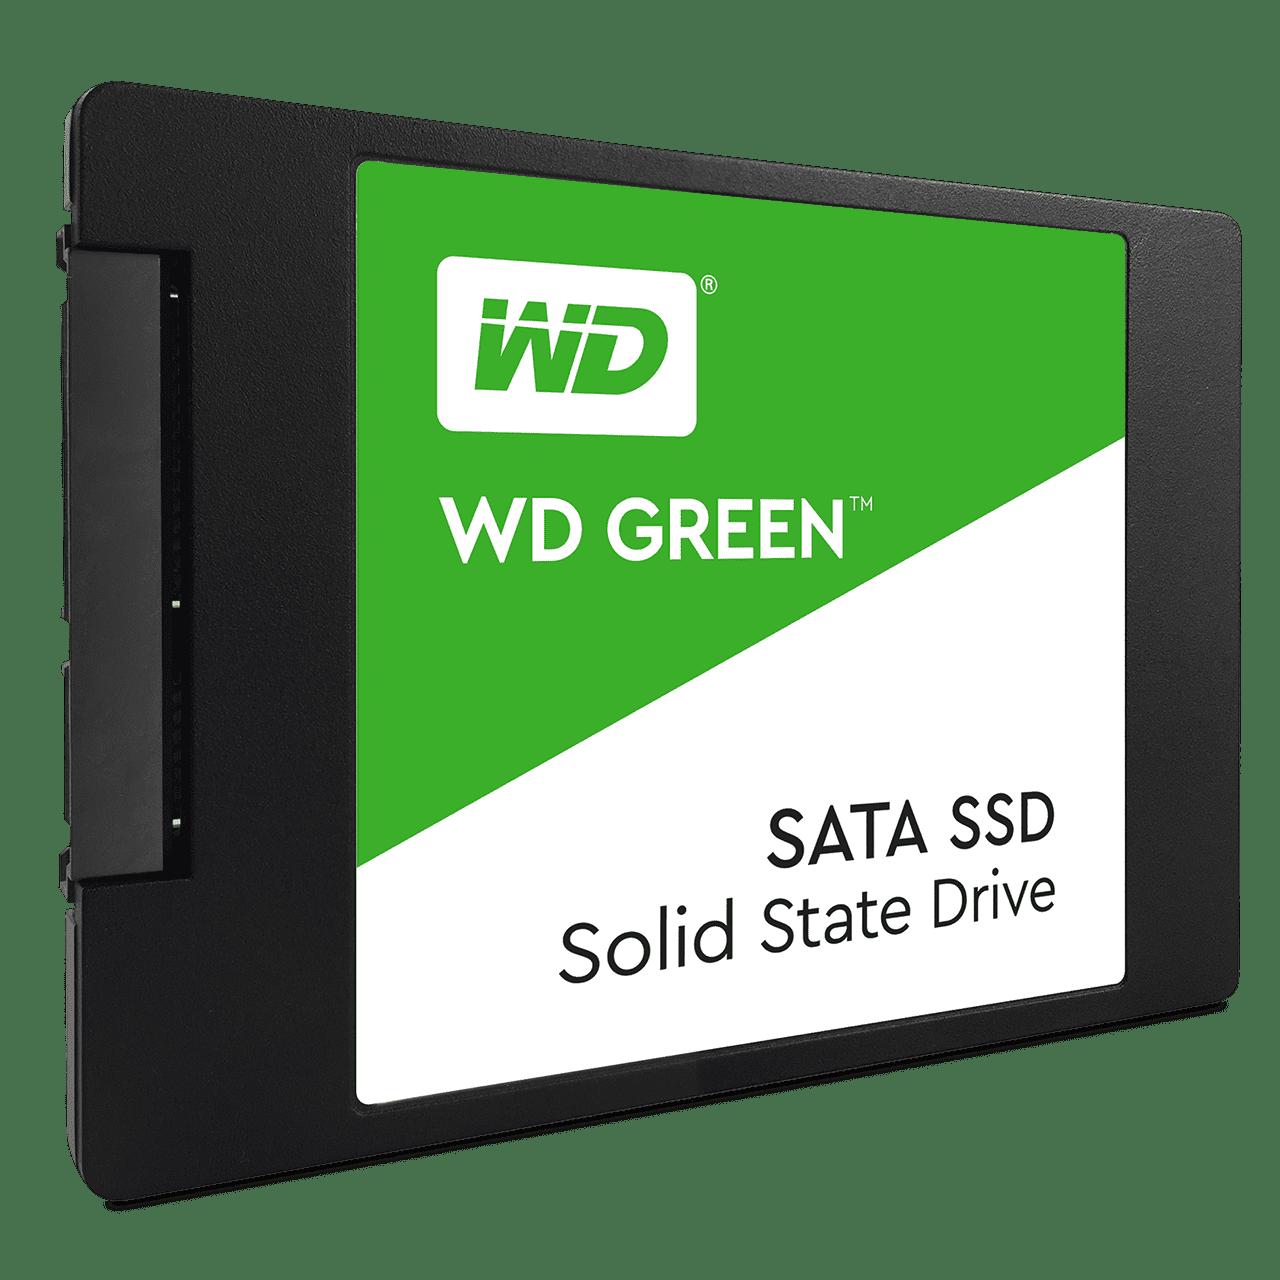 SSD 240GB WD GREEN WDS240G2G0A, SATA3 R545Mb/s W465Mb/s